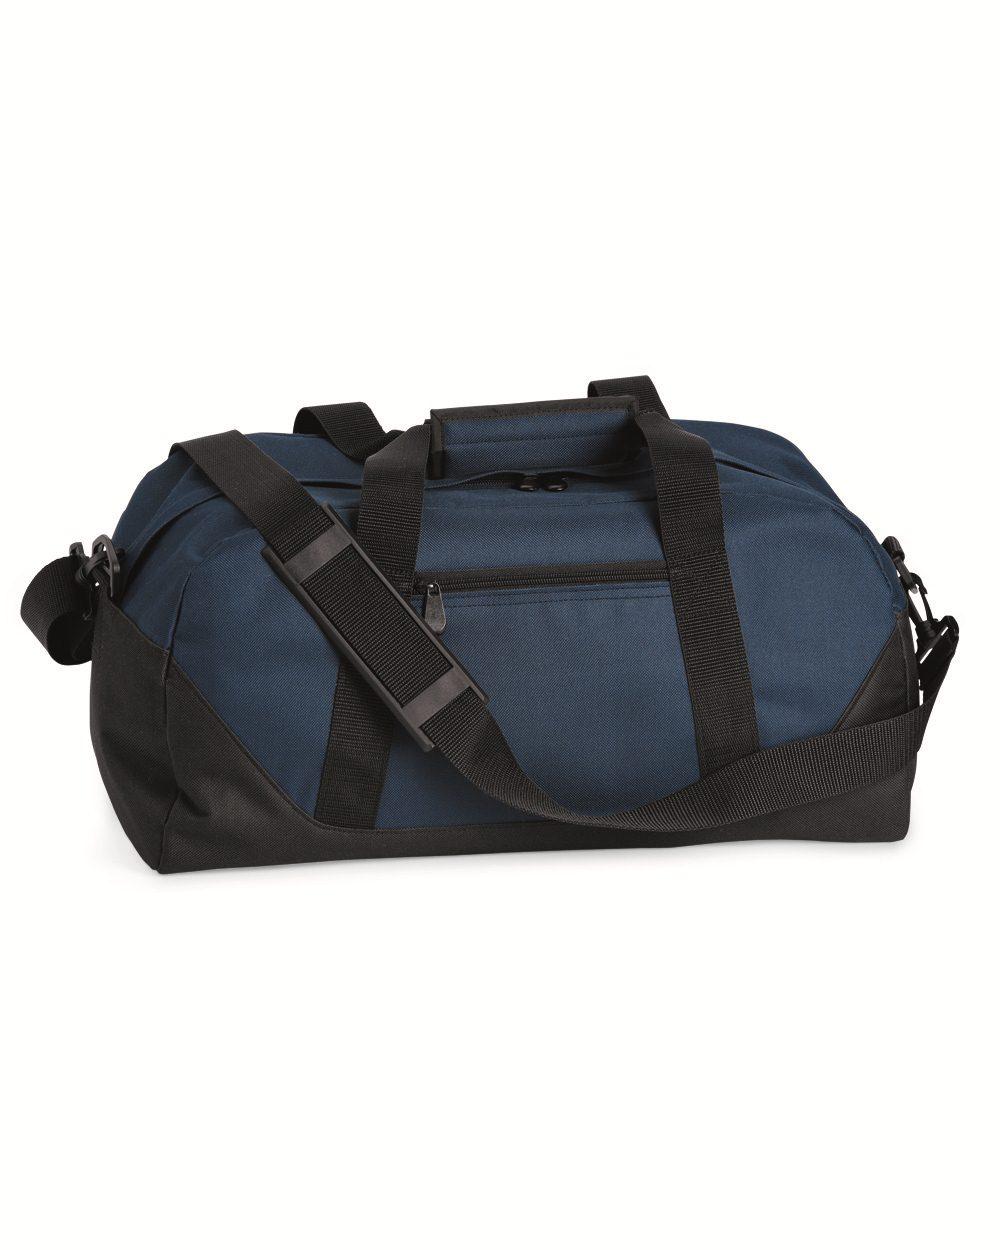 Liberty Bags Liberty Series 18 Inch Duffel - 2250